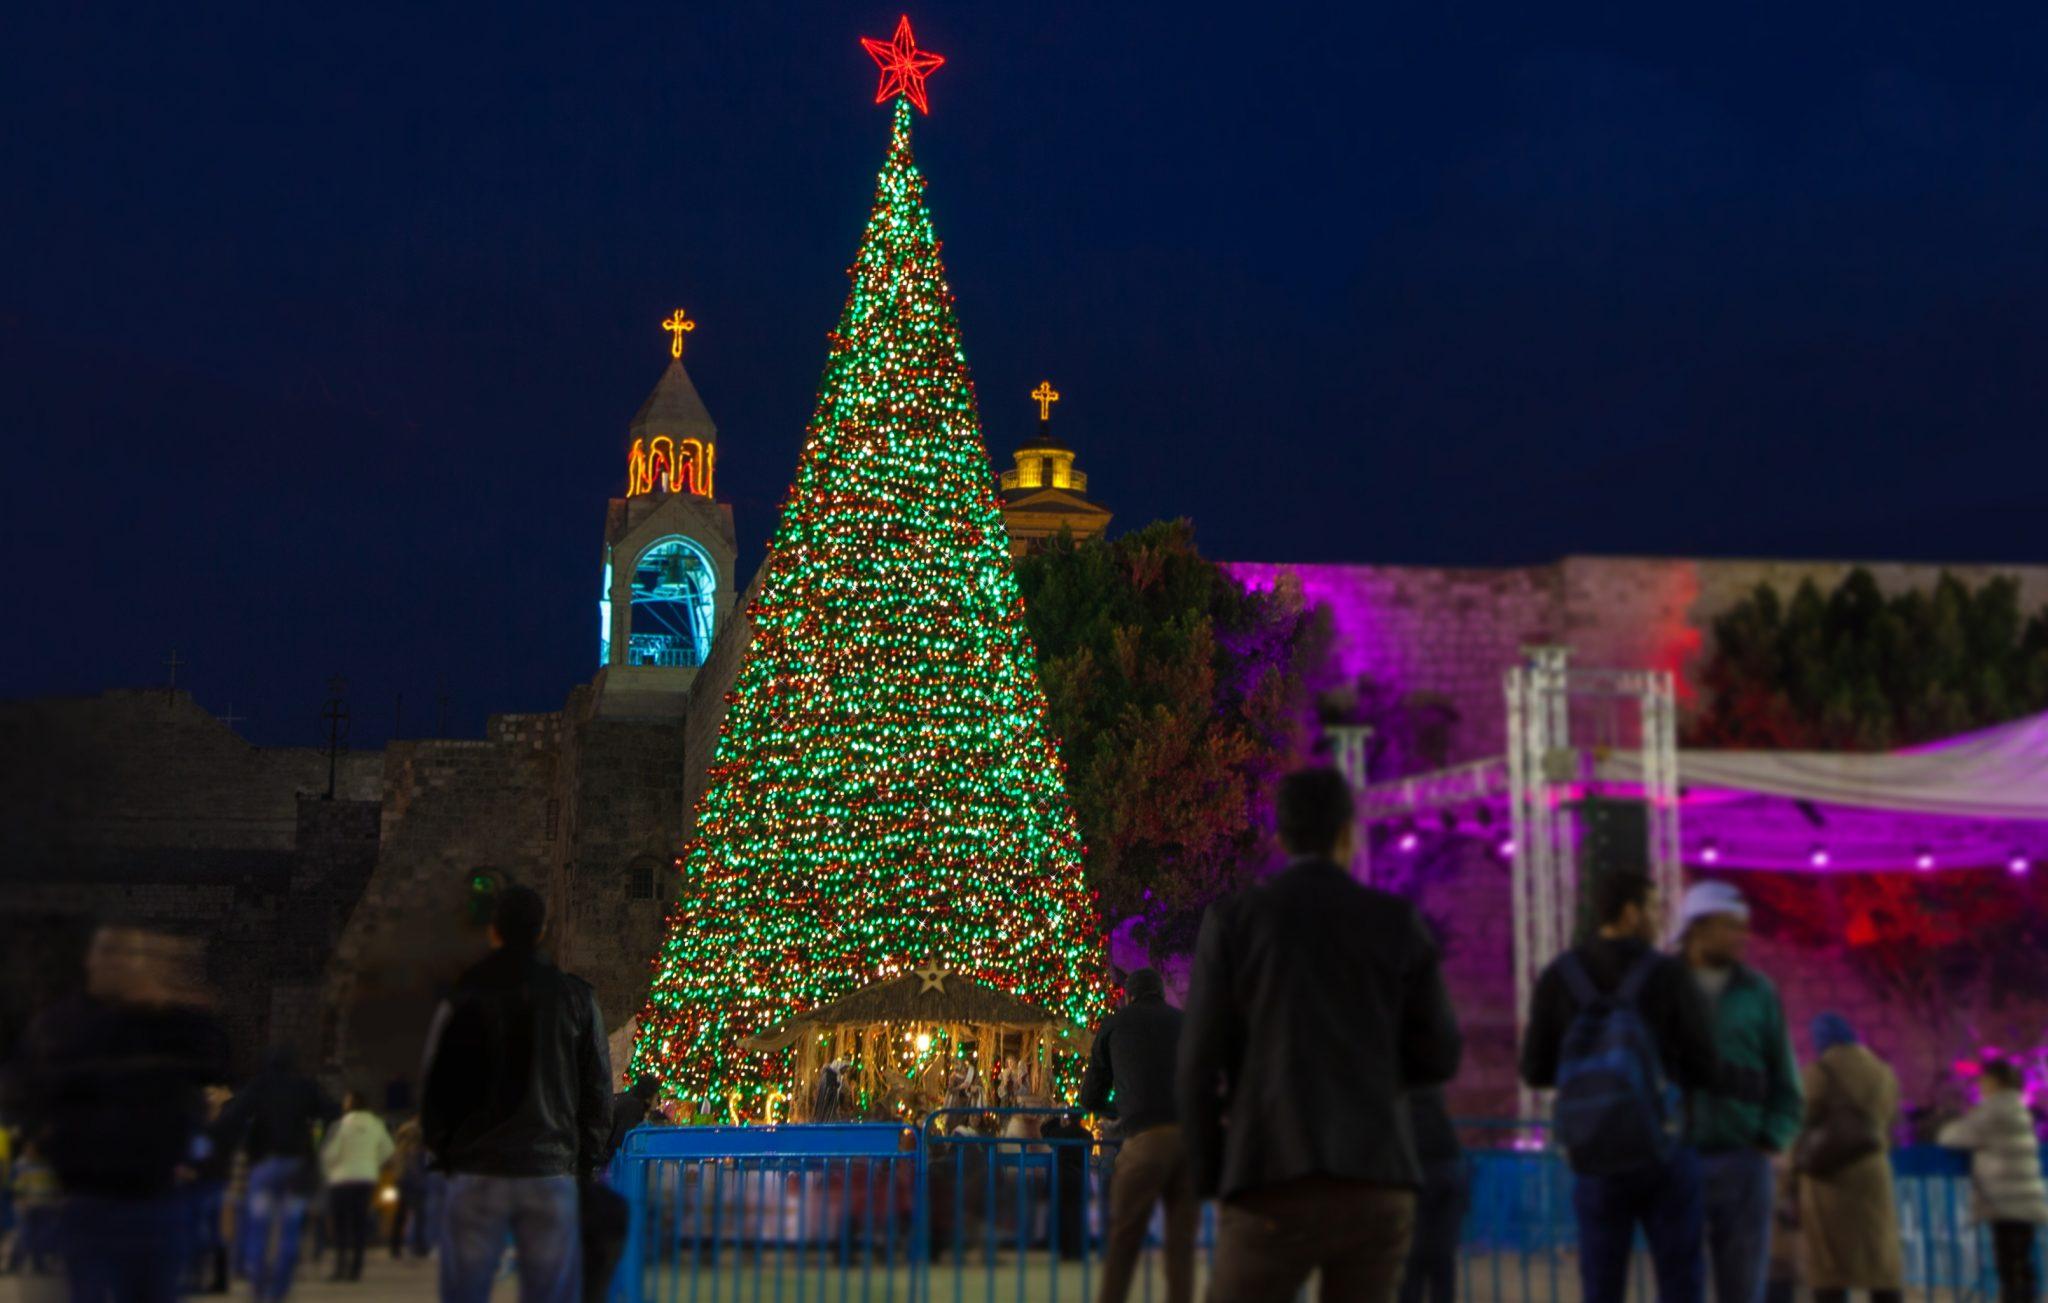 Bespoke large artificial Christmas tree